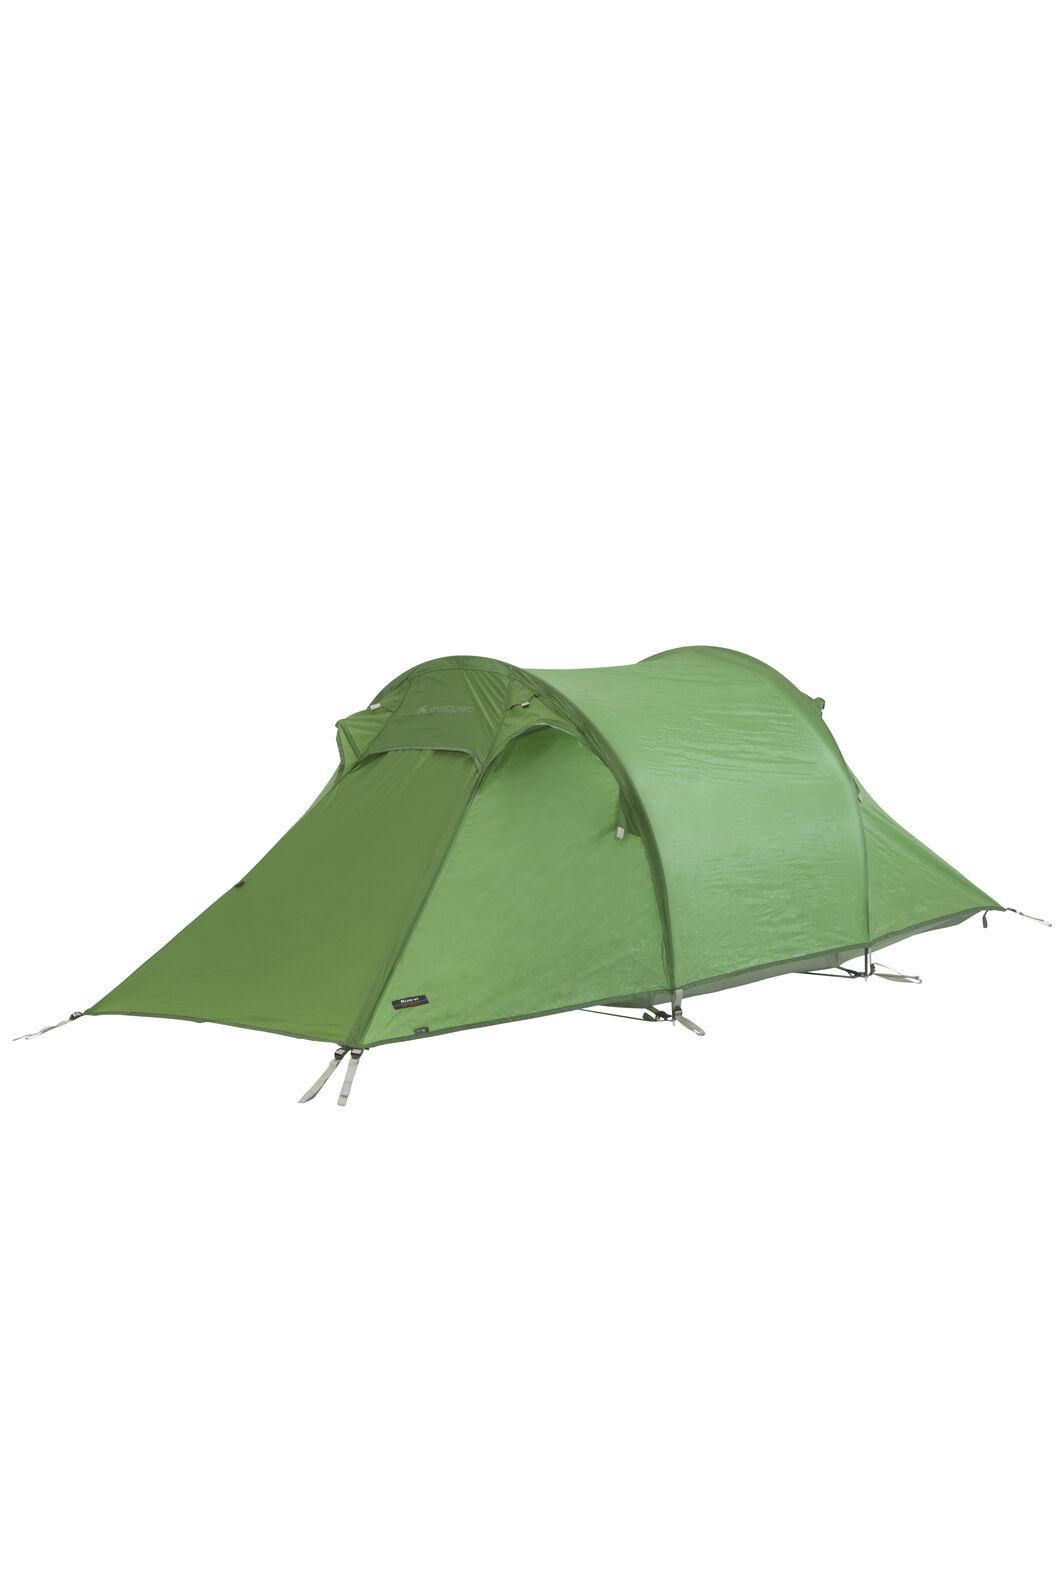 Macpac Minaret Two Person Hiking Tent, Kiwi, hi-res